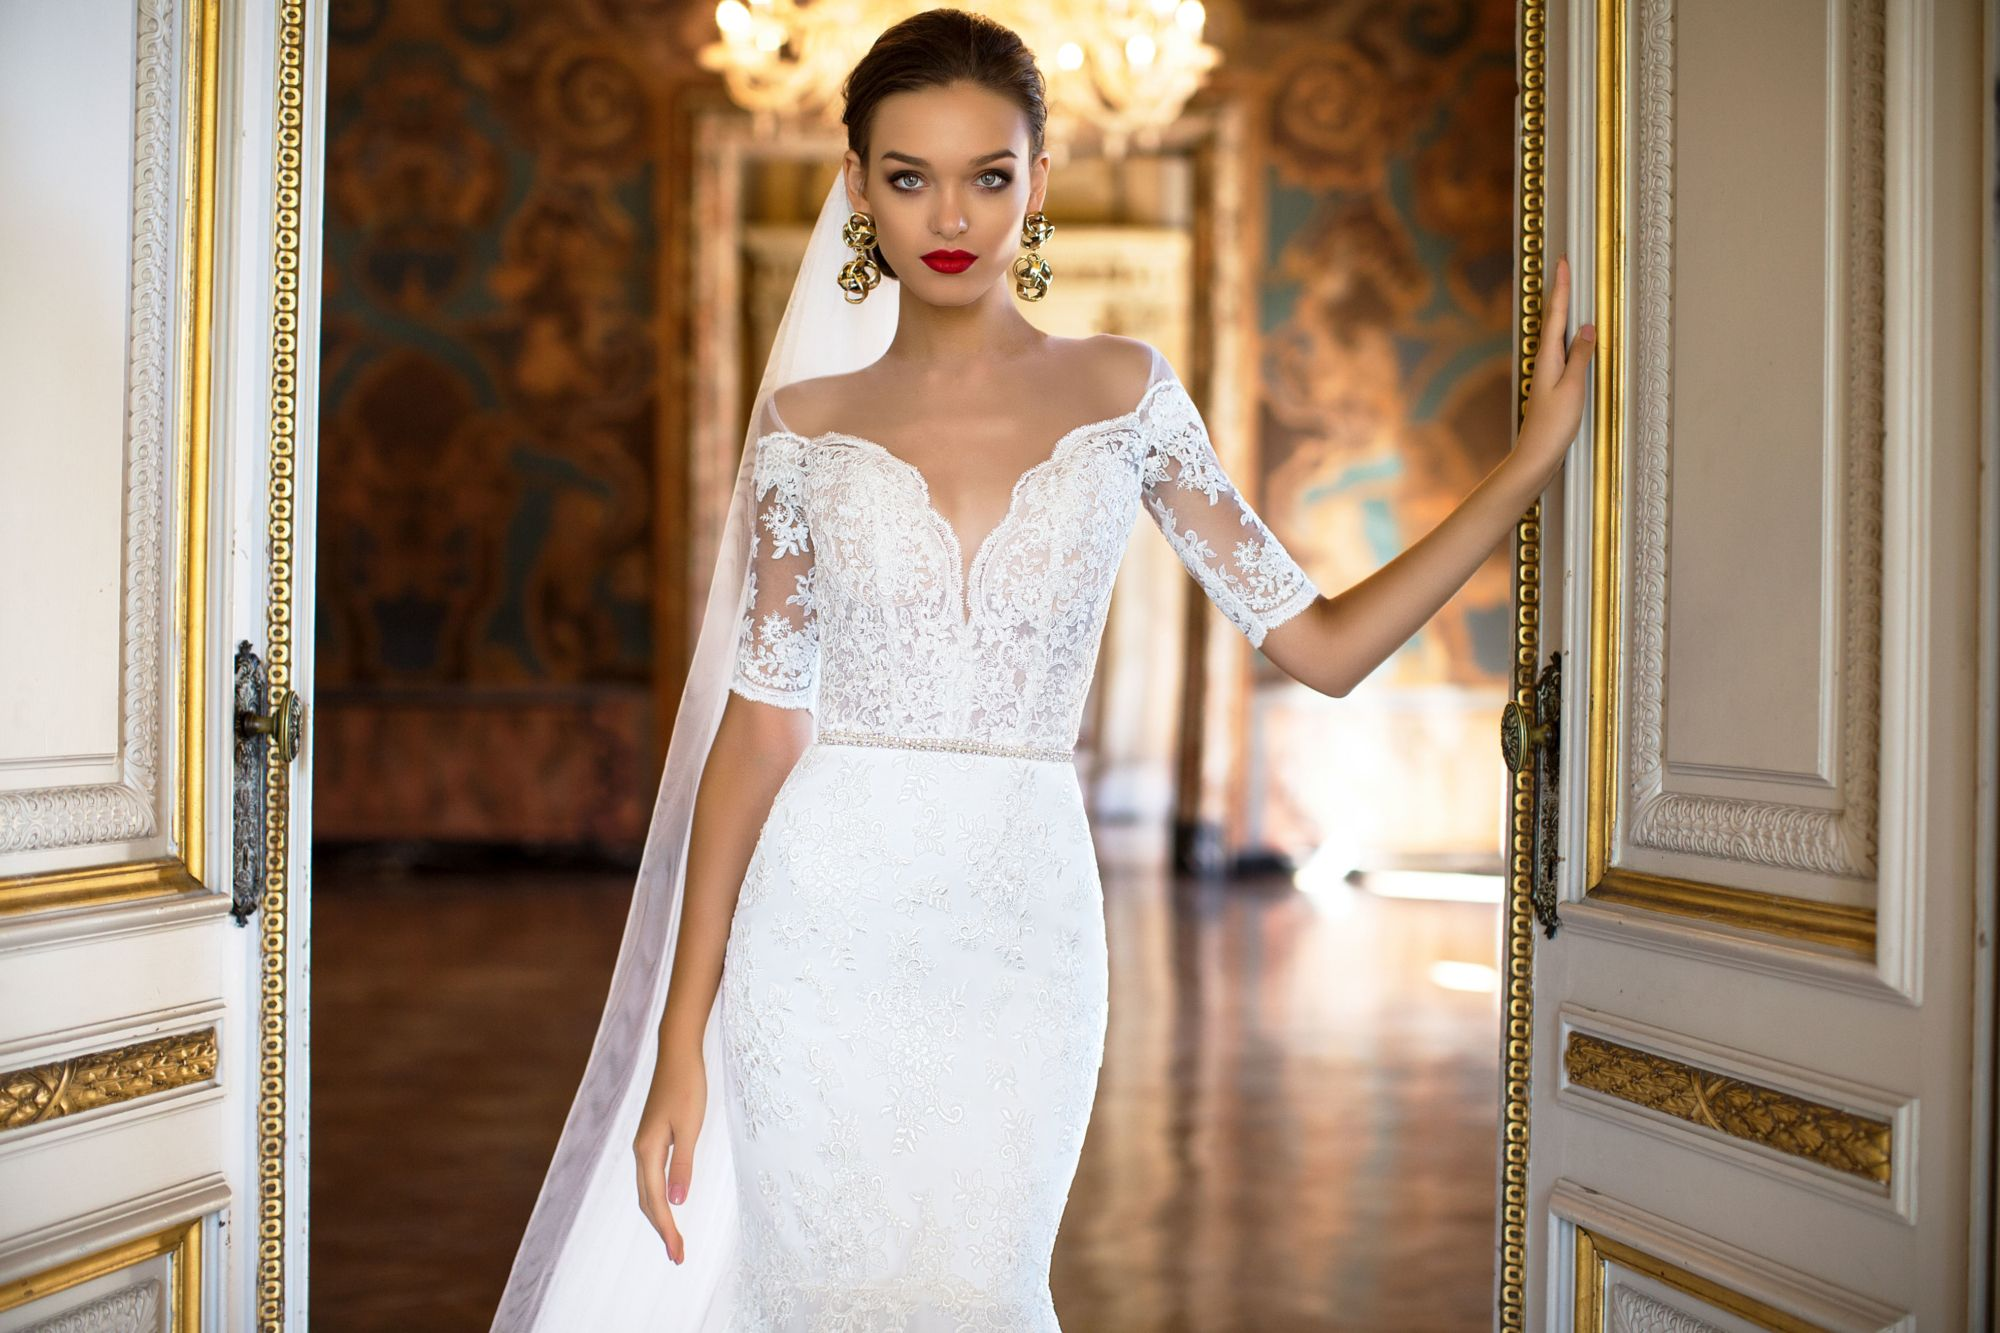 Undergarments for lace wedding dress  Rita  White Desire  MillaNova  MillaNova  Rita  Pinterest